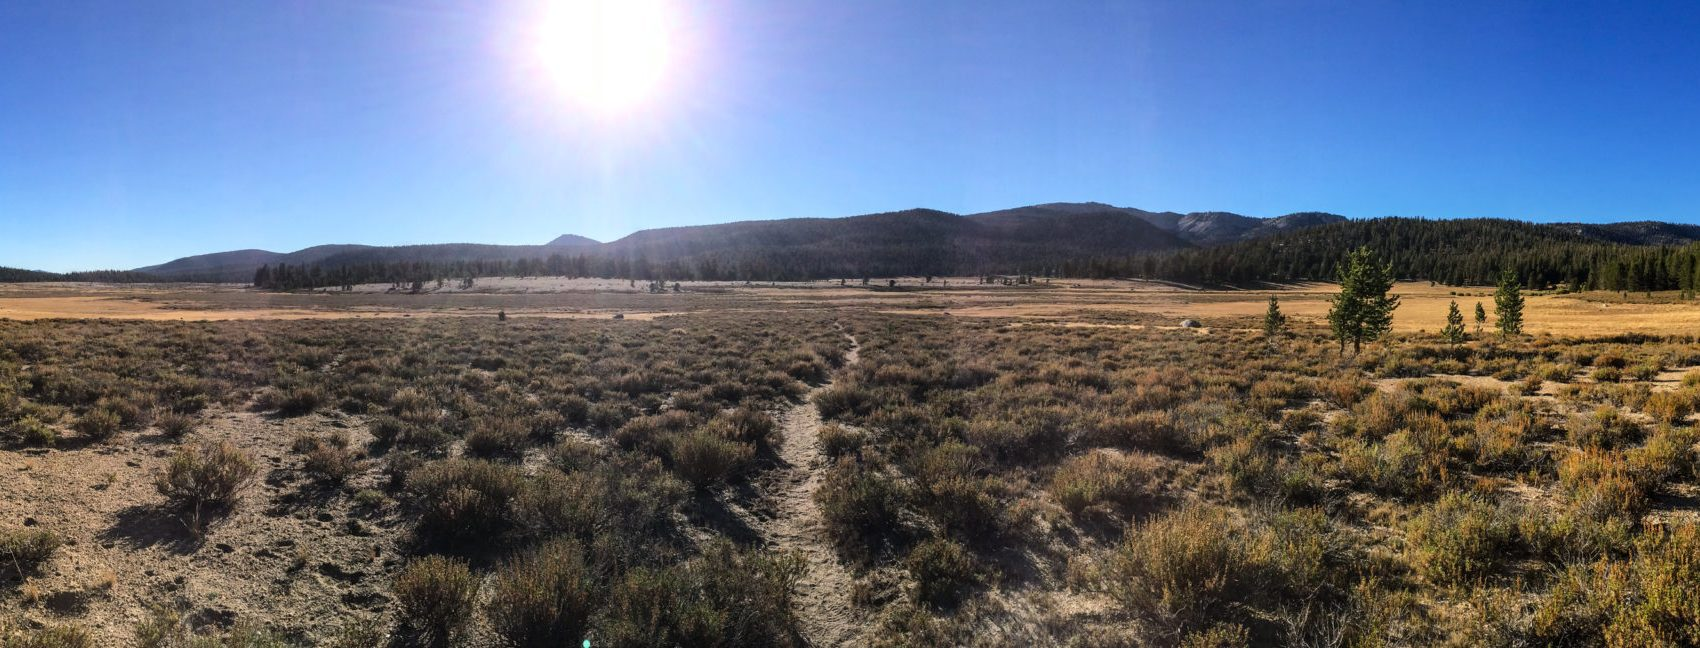 Empty Trail